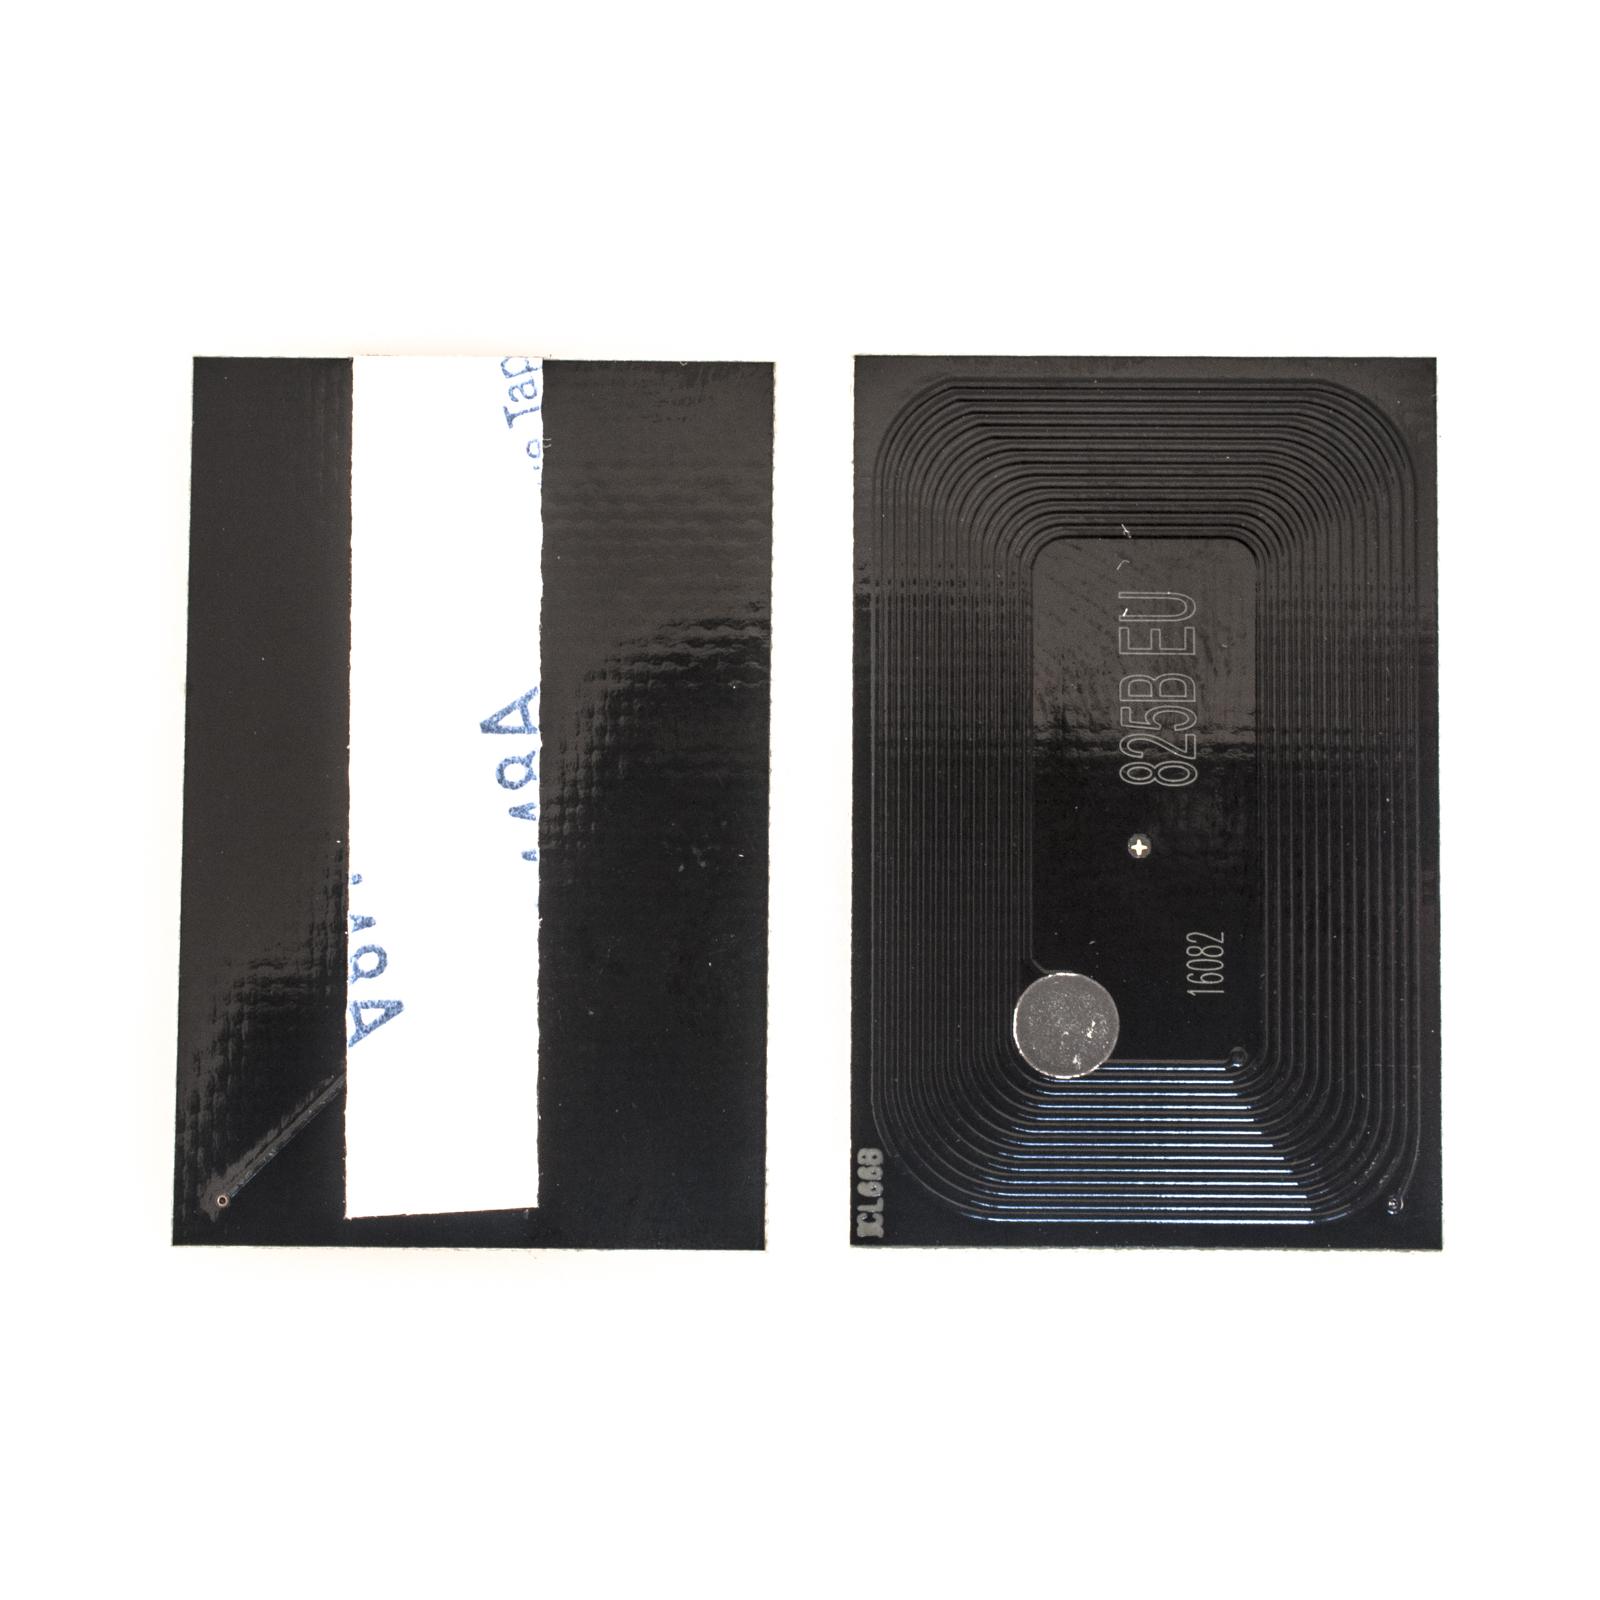 Чип для картриджа KYOCERA TK-825, BLACK Everprint (CHIP-KYO-TK-825-B)